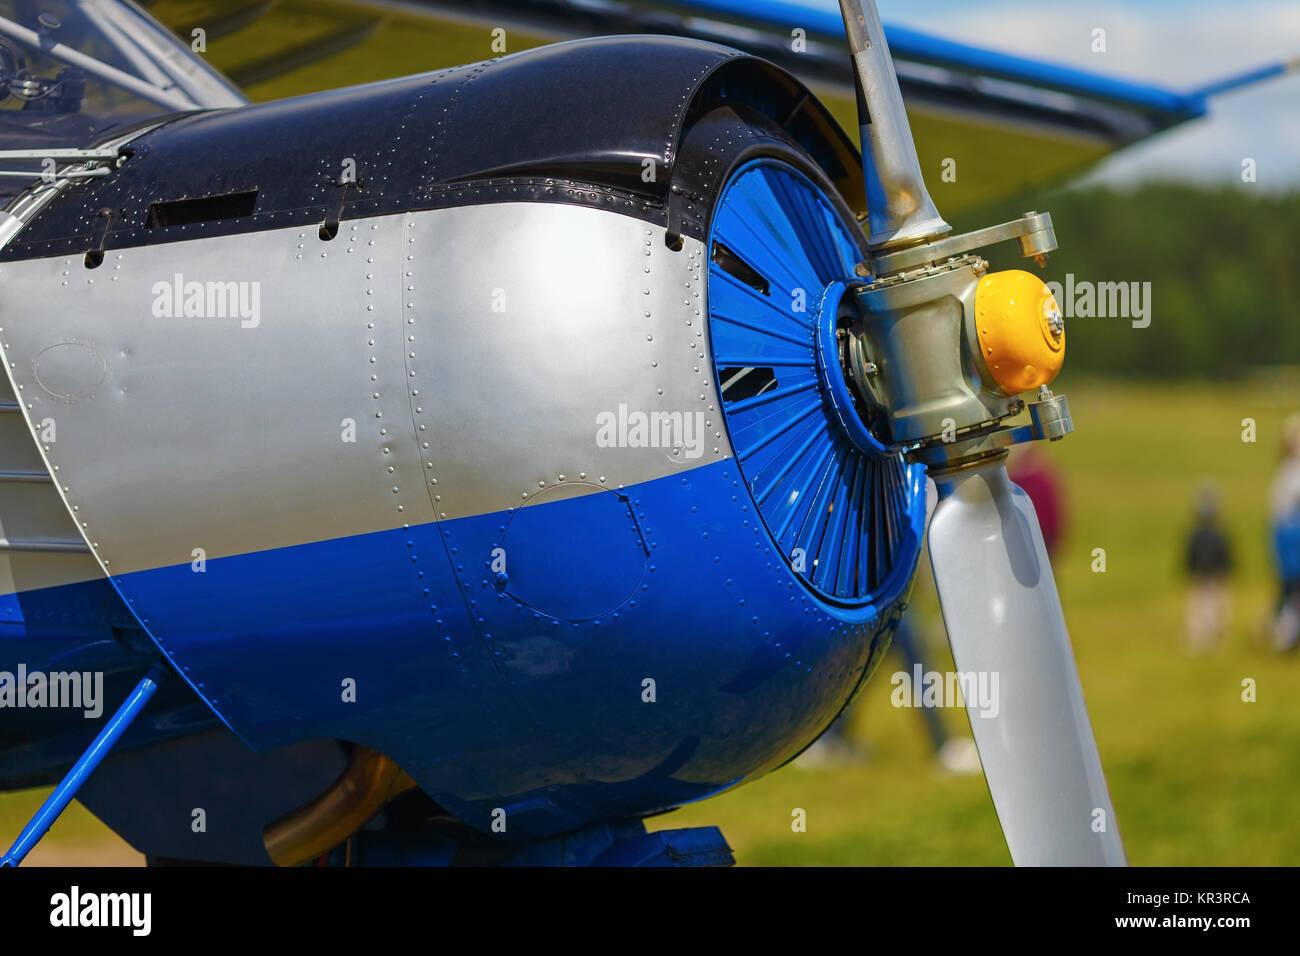 Blue airplane fuselage - Stock Image